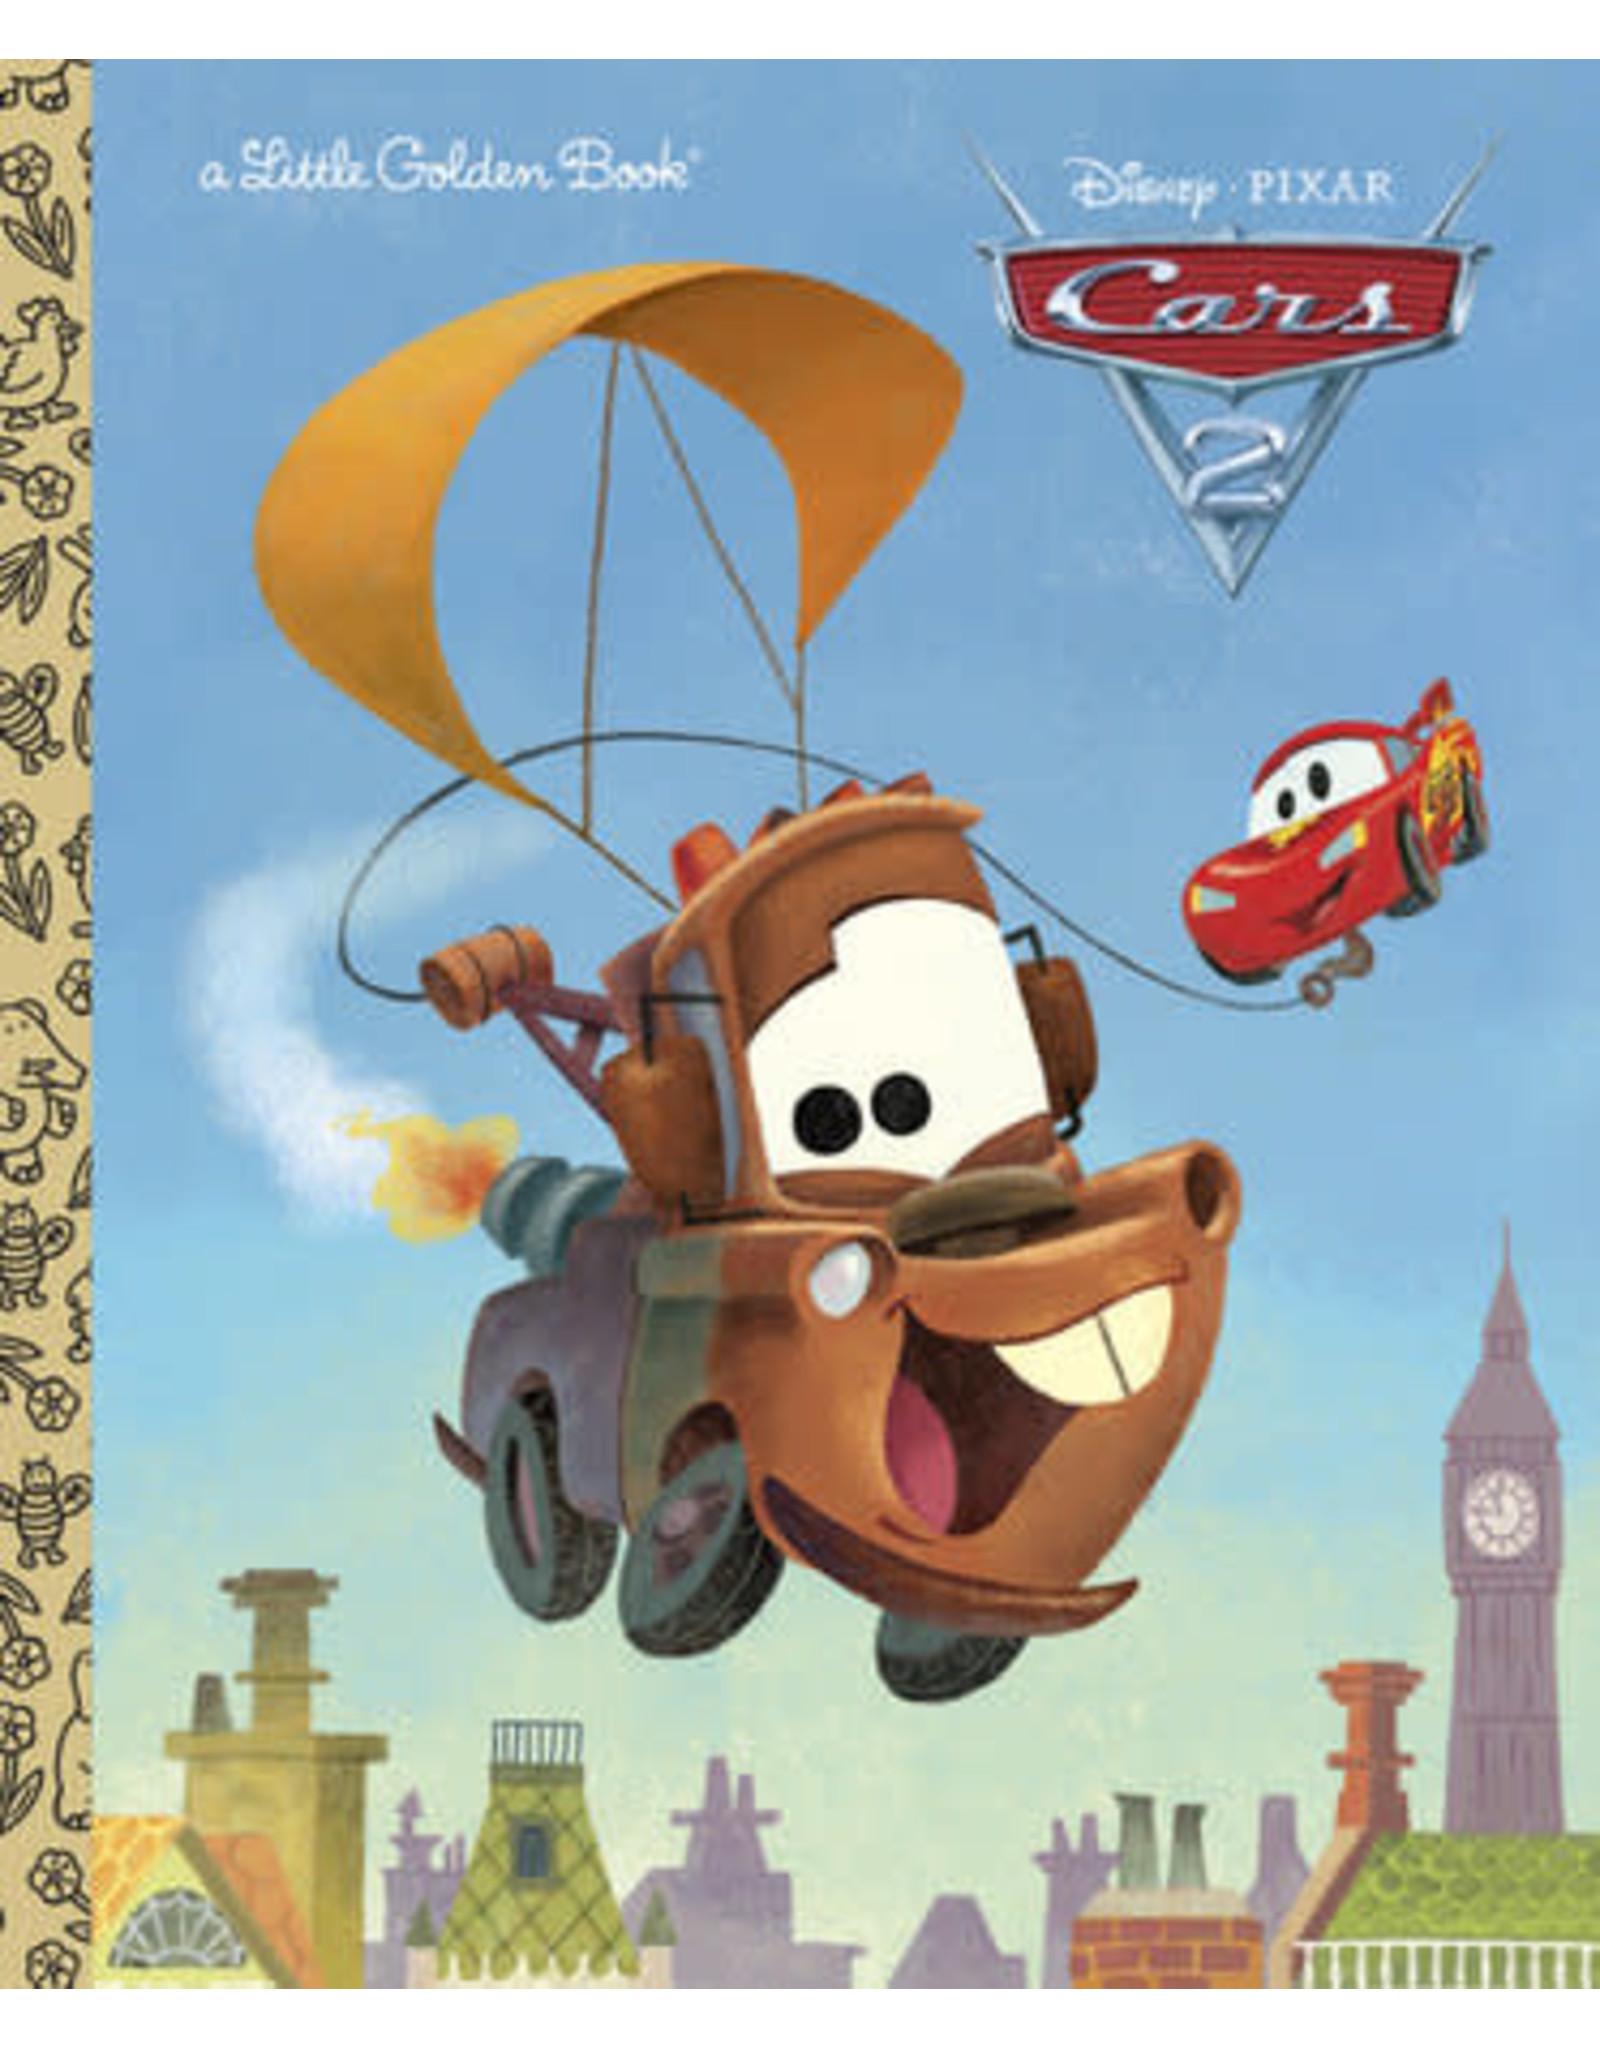 Little Golden Books Cars 2 Little Golden Book (Disney/Pixar Cars 2)